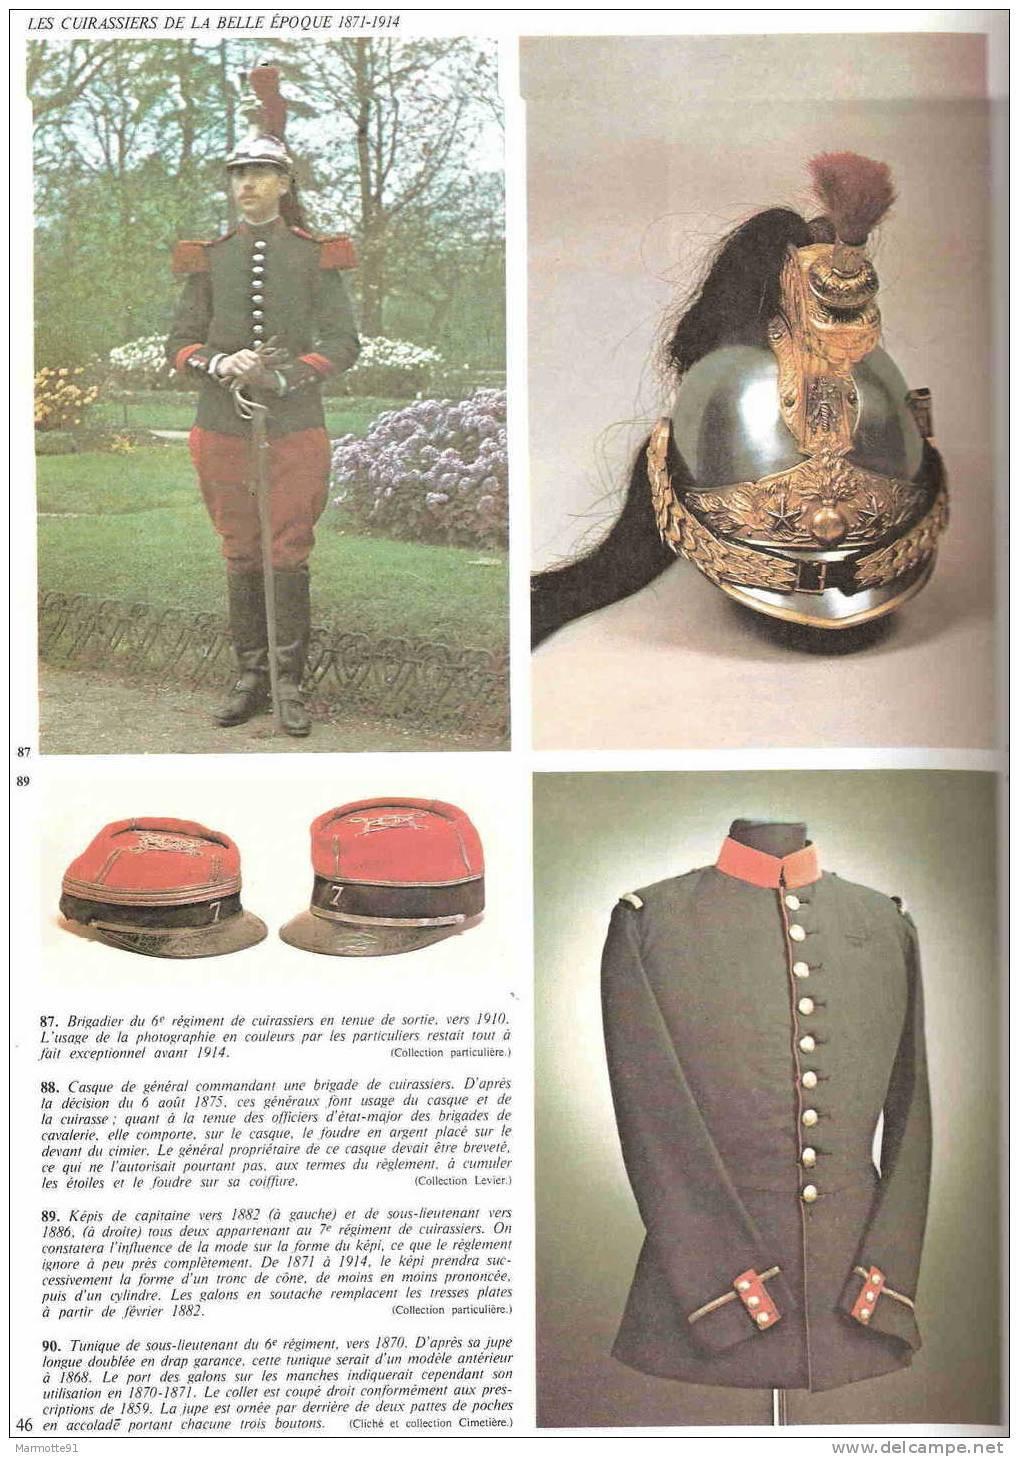 HISTORIQUE LES CUIRASSIERS 1845 1918 CAVALERIE UNIFORME CASQUE CUIRASSE SABRE EMPIRE GUERRE 1870 1914 - Libri